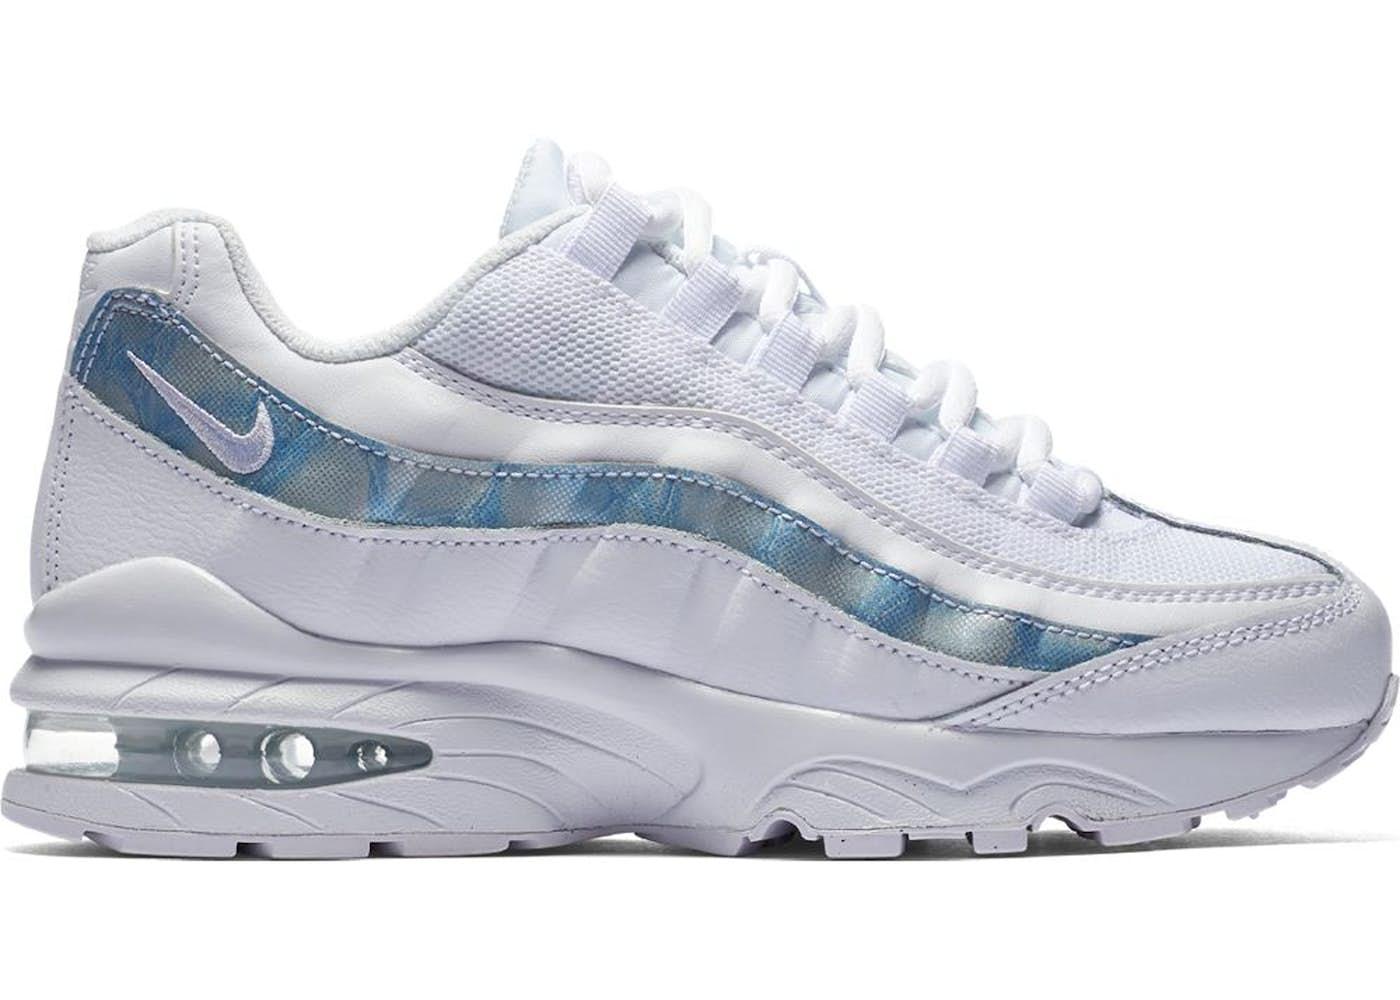 sports shoes 5d0c7 04762 Air Max 95 White Cobalt Pulse (GS)